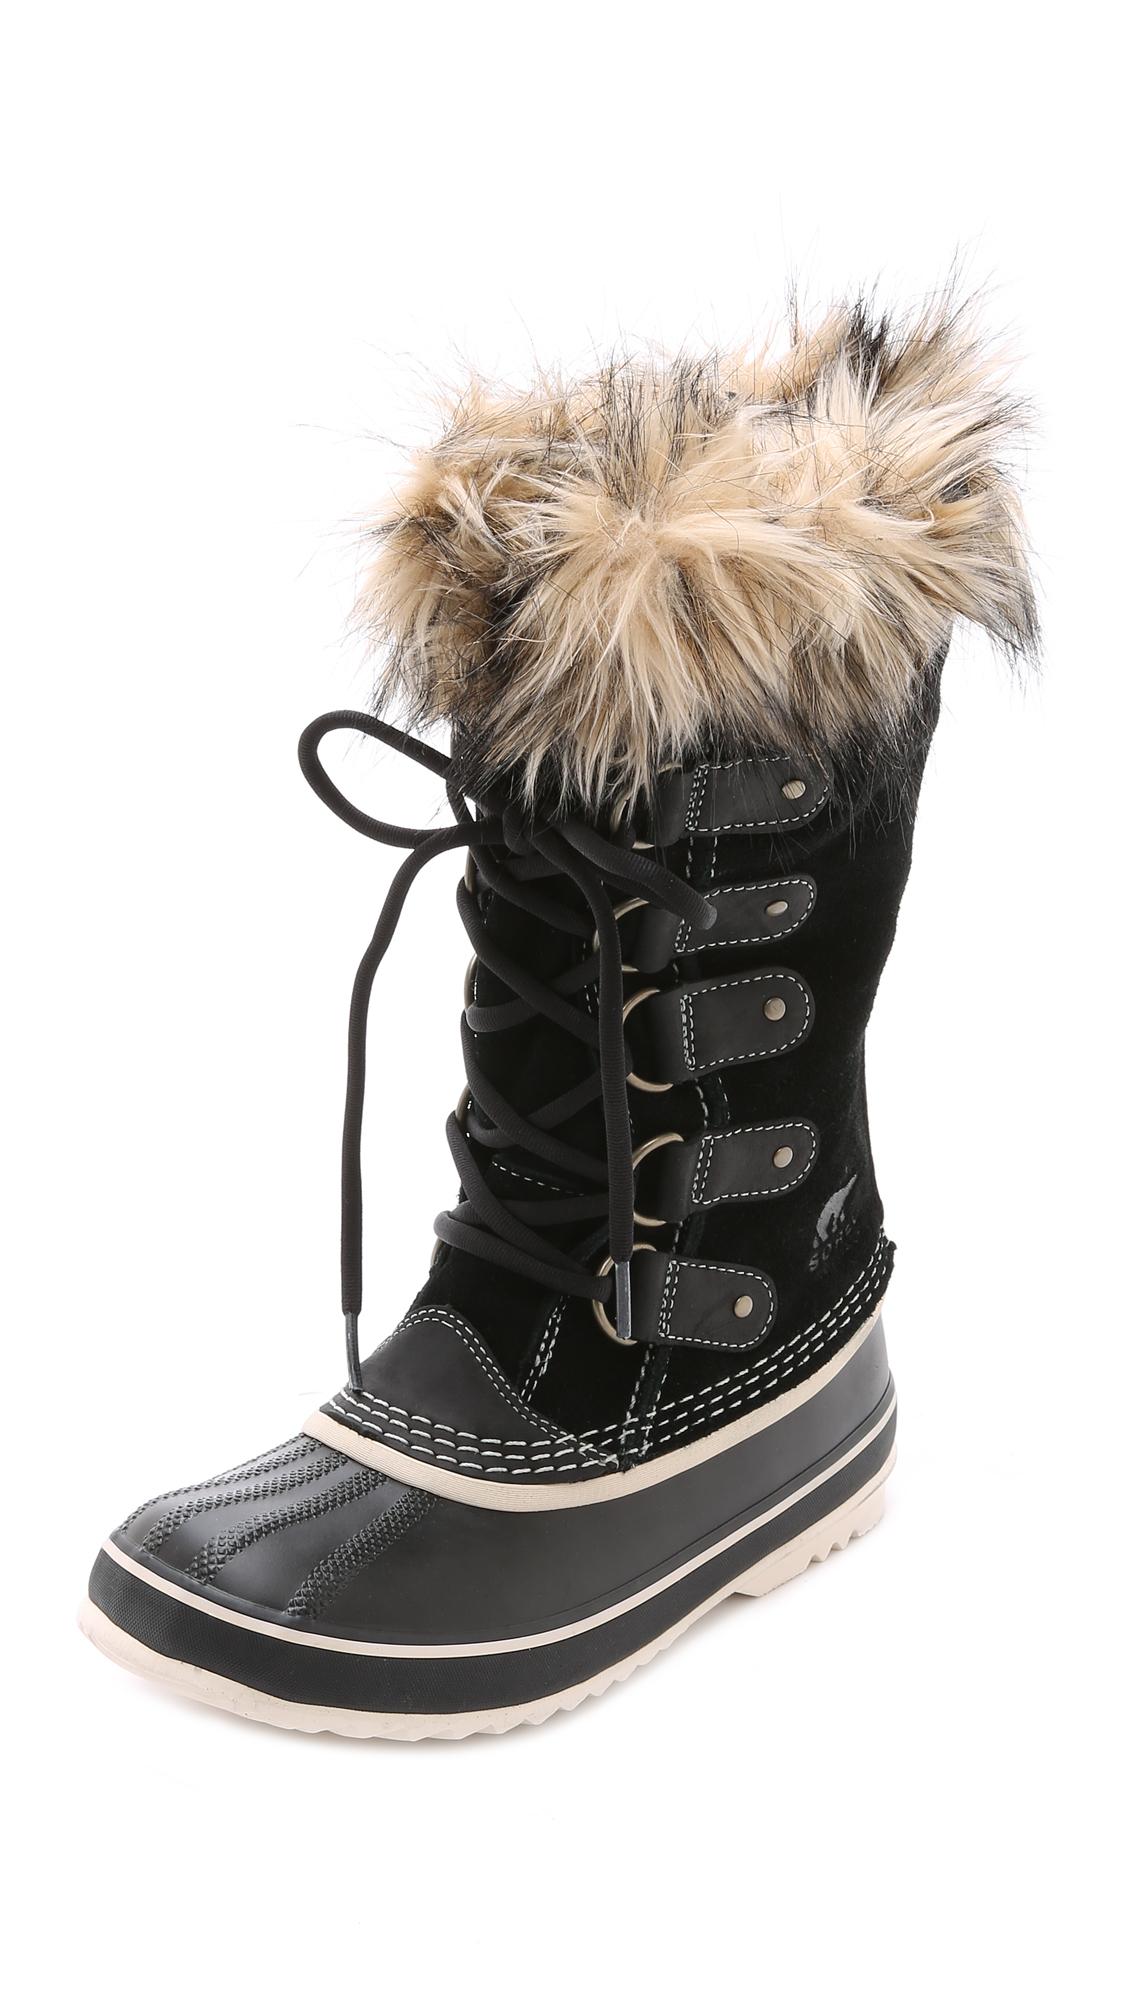 sorel joan of arctic boots in black lyst. Black Bedroom Furniture Sets. Home Design Ideas